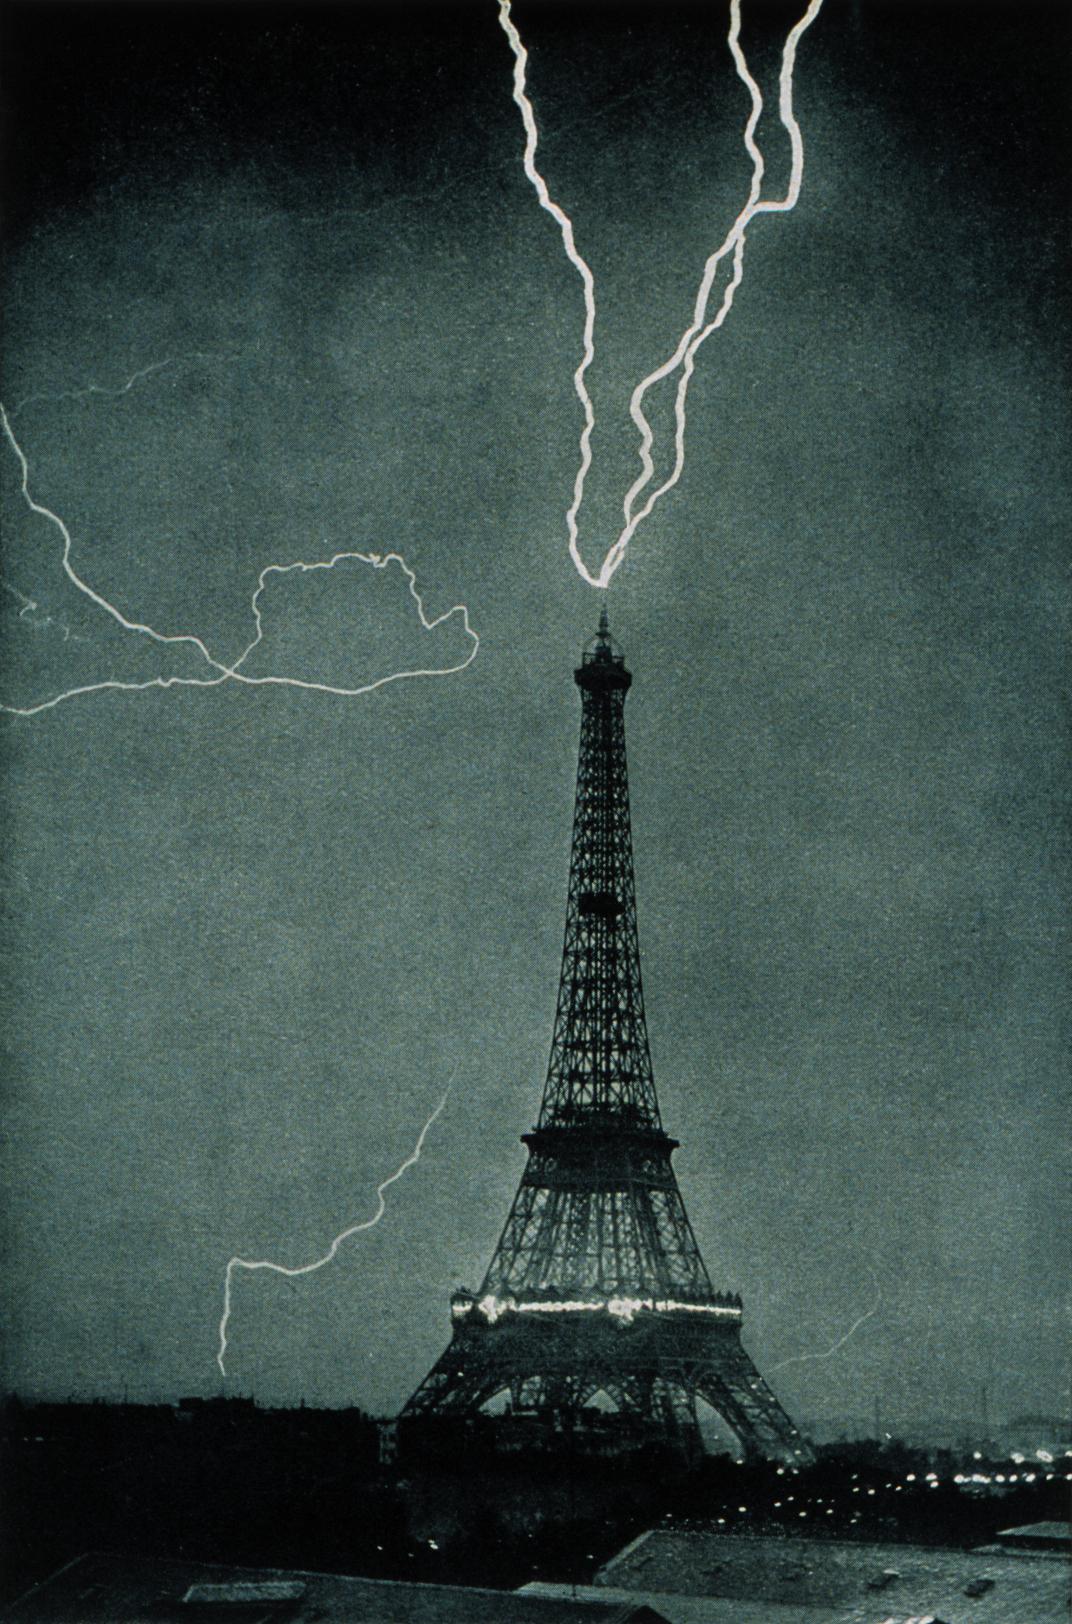 Эйфелева башня как громоотвод